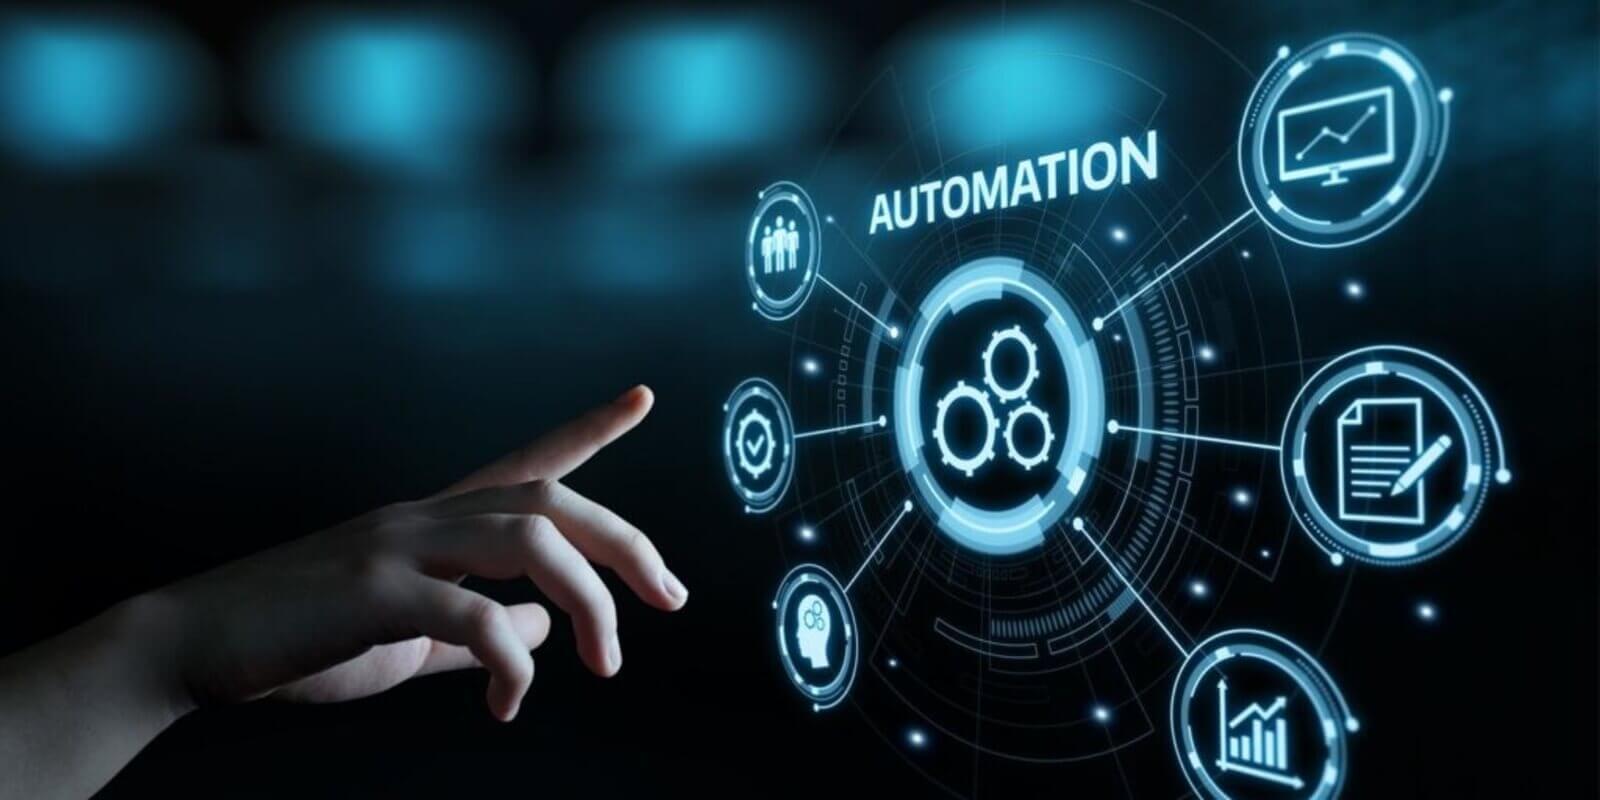 automation